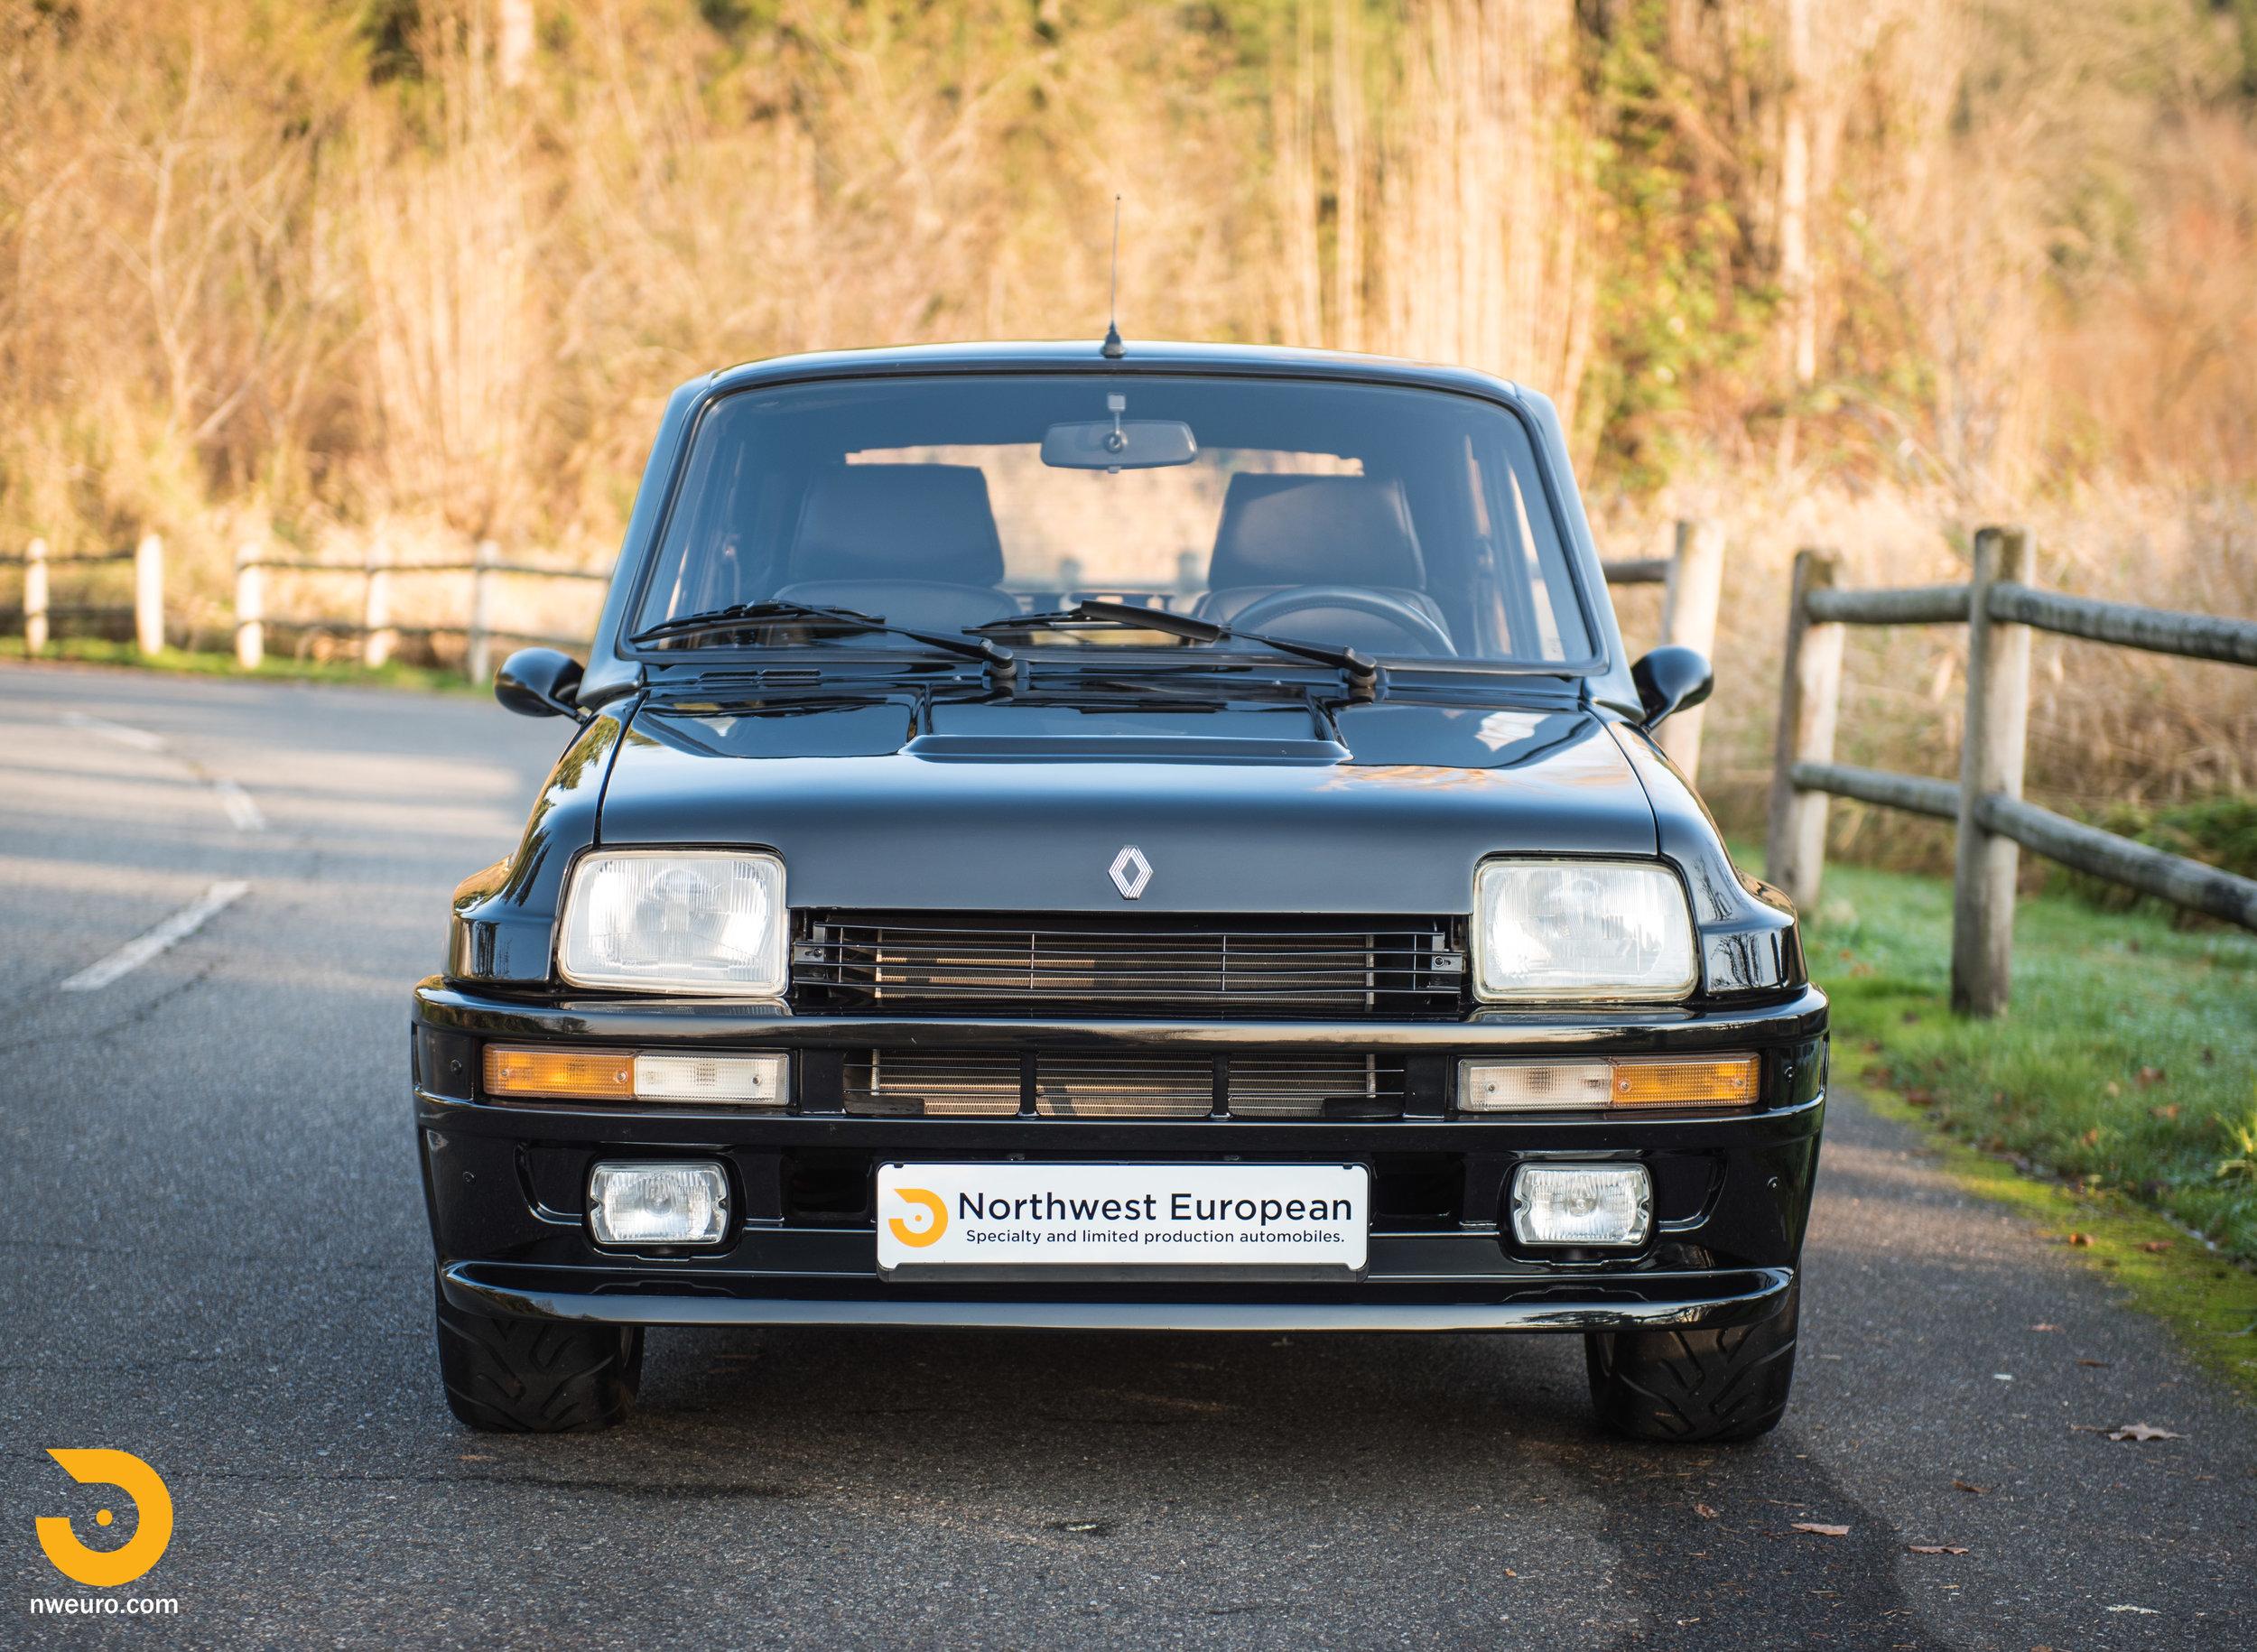 1983 Renault R5 Turbo 2 Black at Park-6.jpg